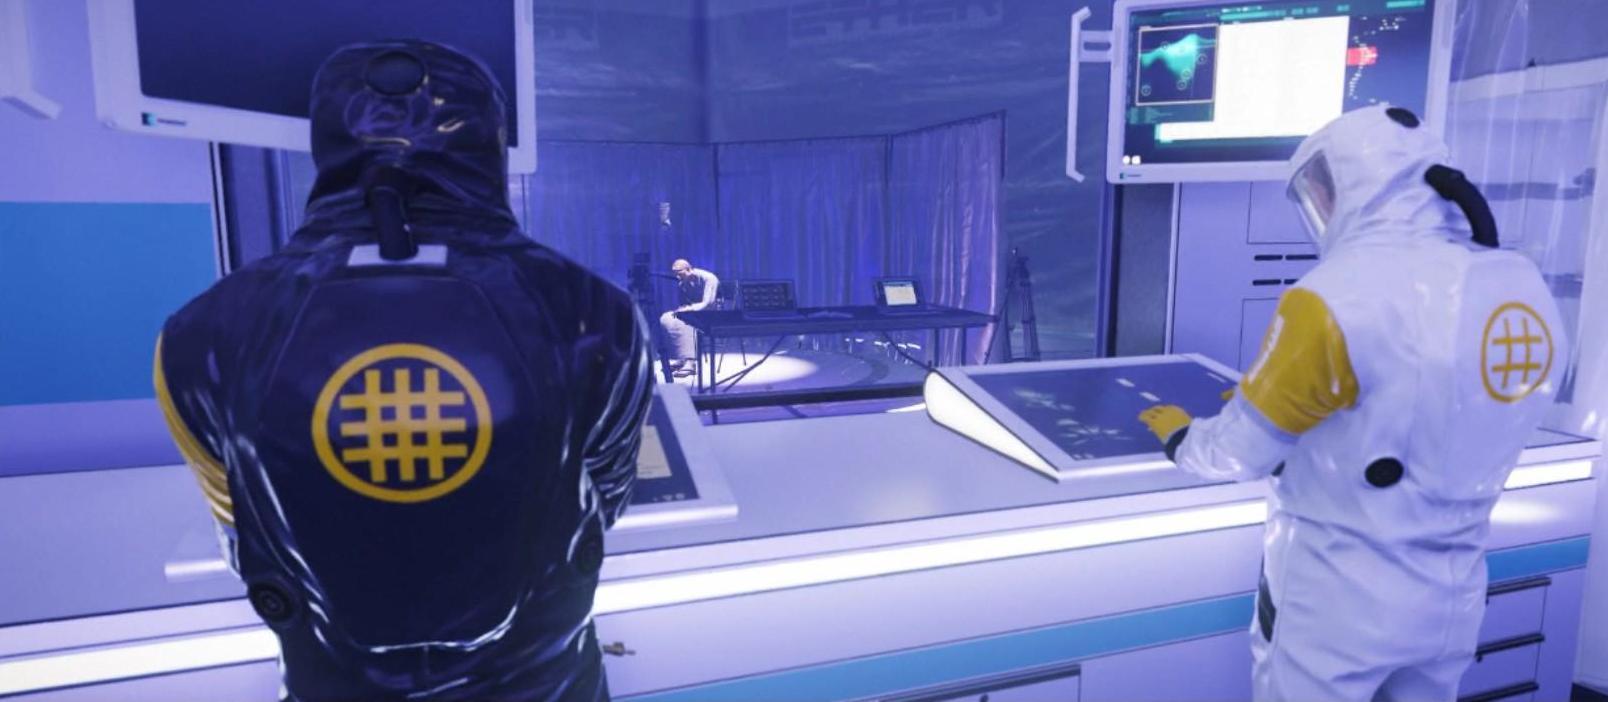 Hitman Silent Assassin Suit Only Guide For Patient Zero